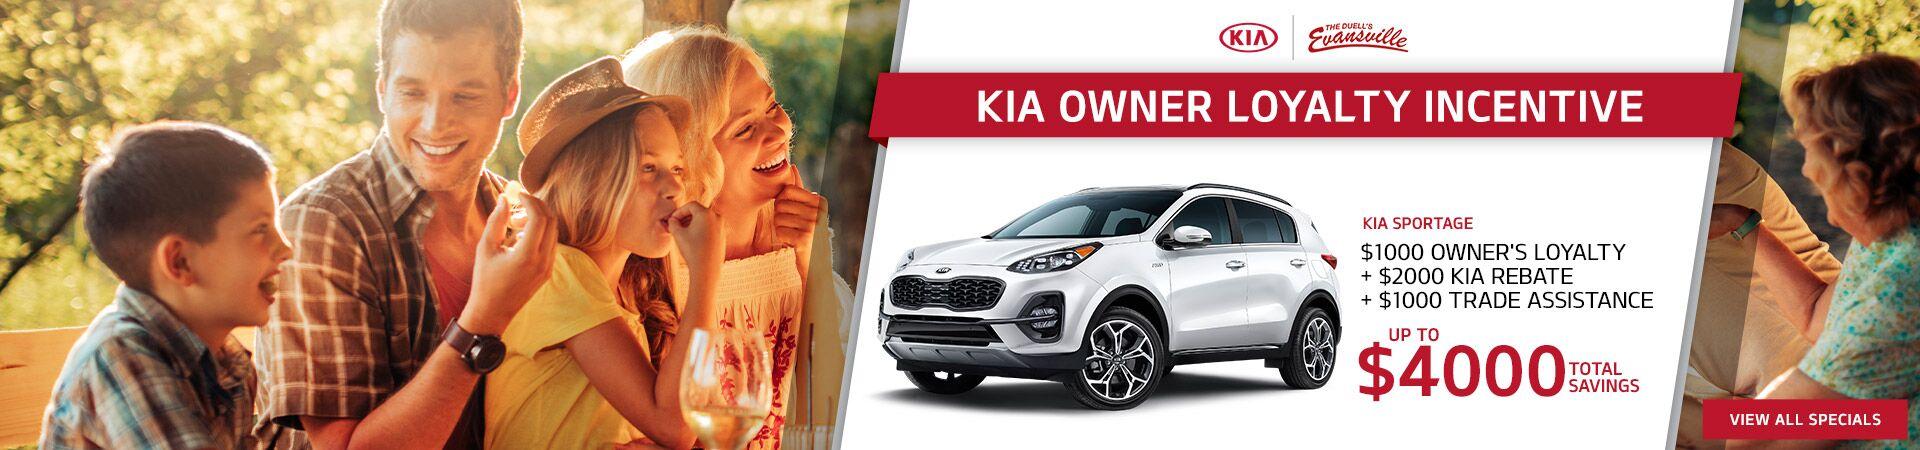 Kia Sportage Owner Loyalty Offer